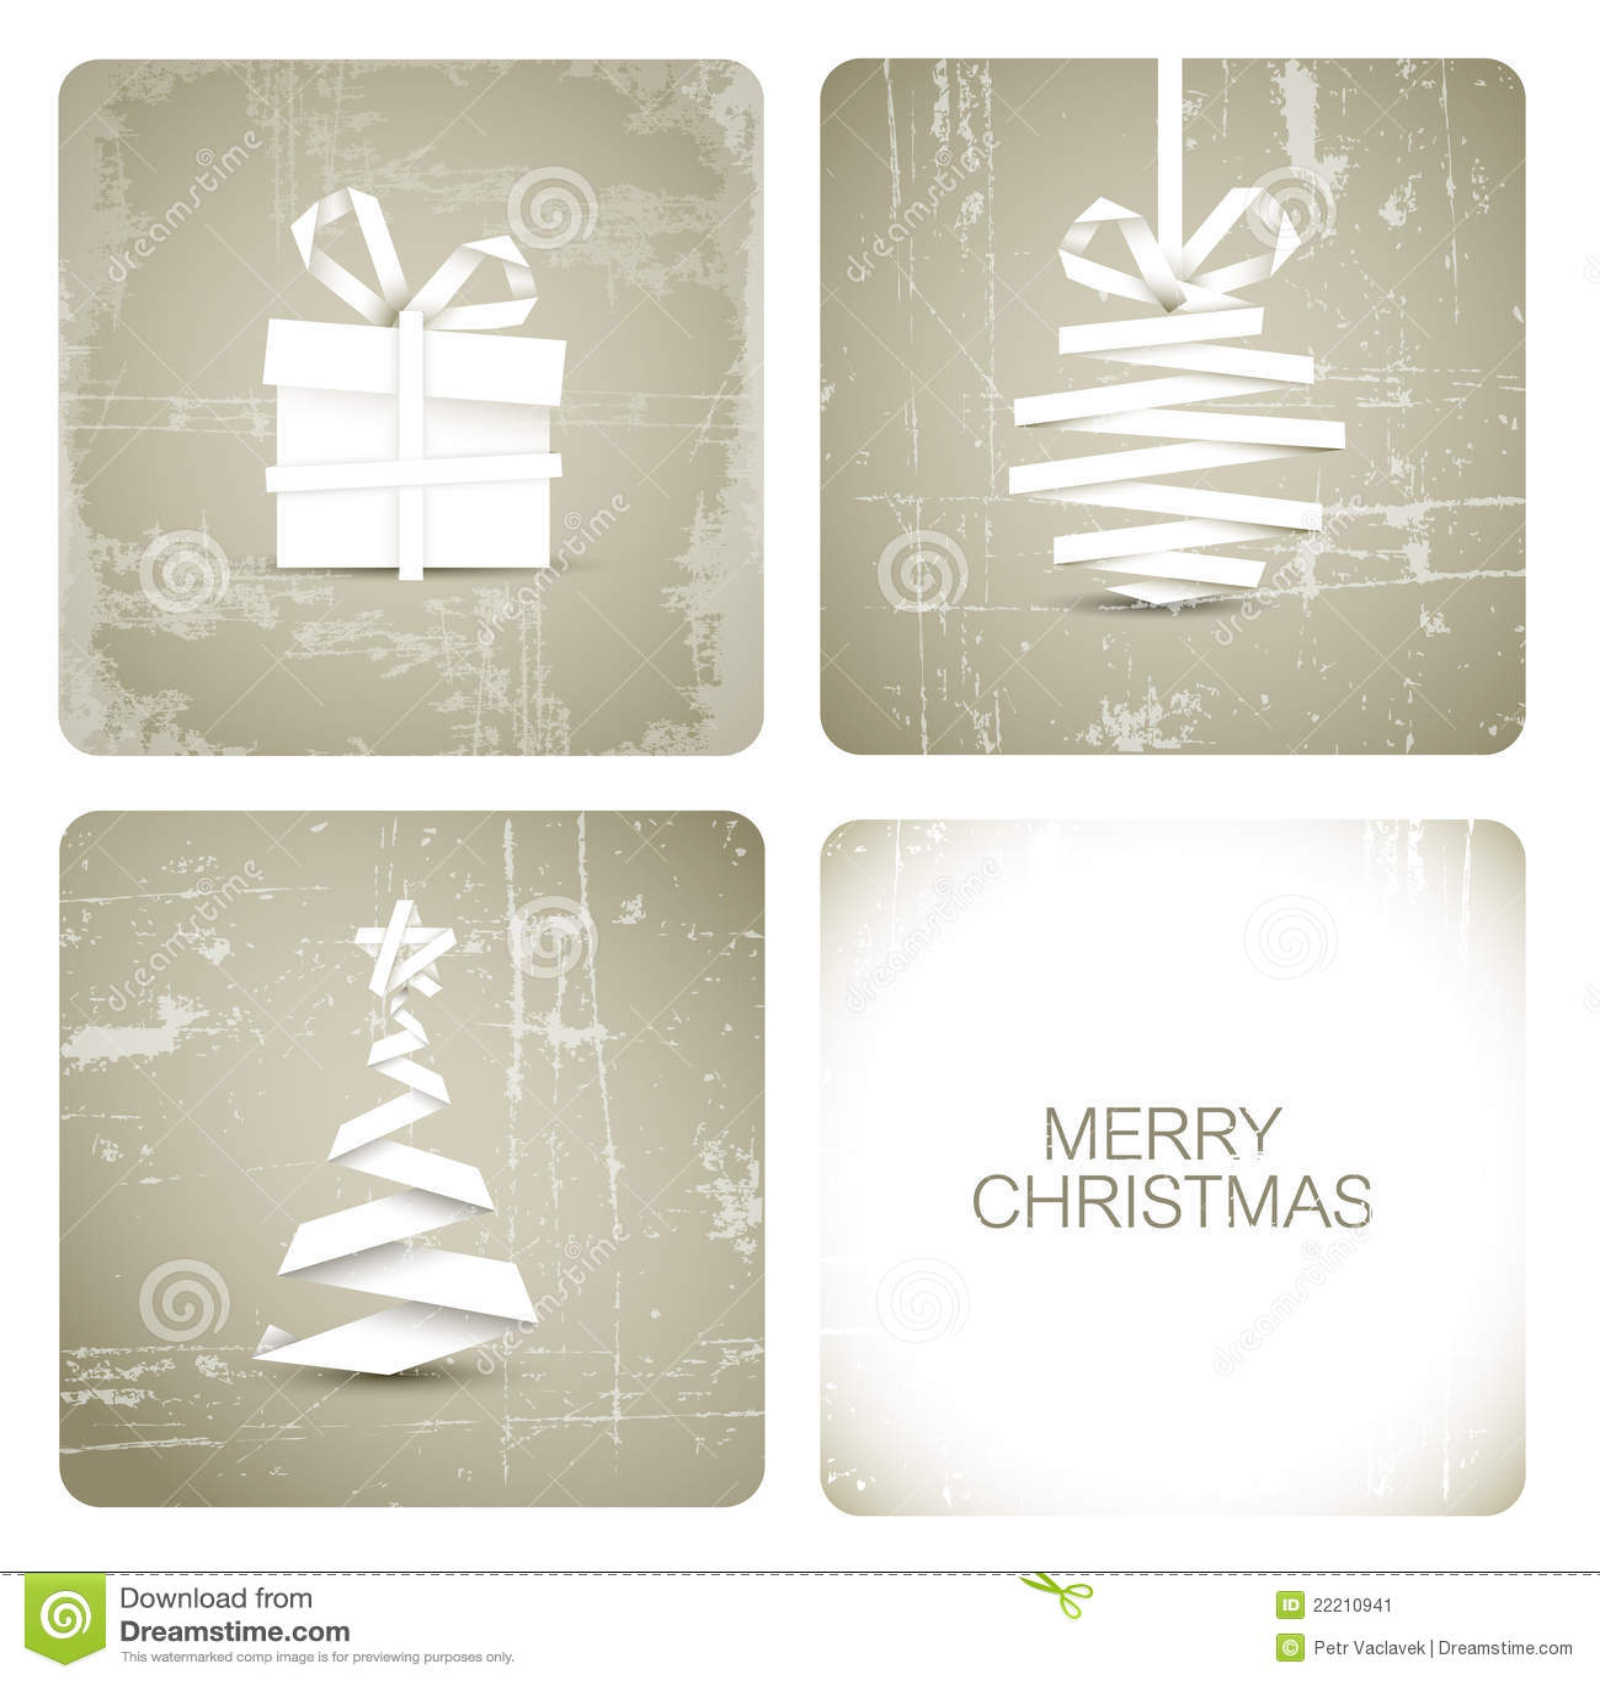 Simple Grunge Christmas Card Stock Vector - Illustration of handmade ...